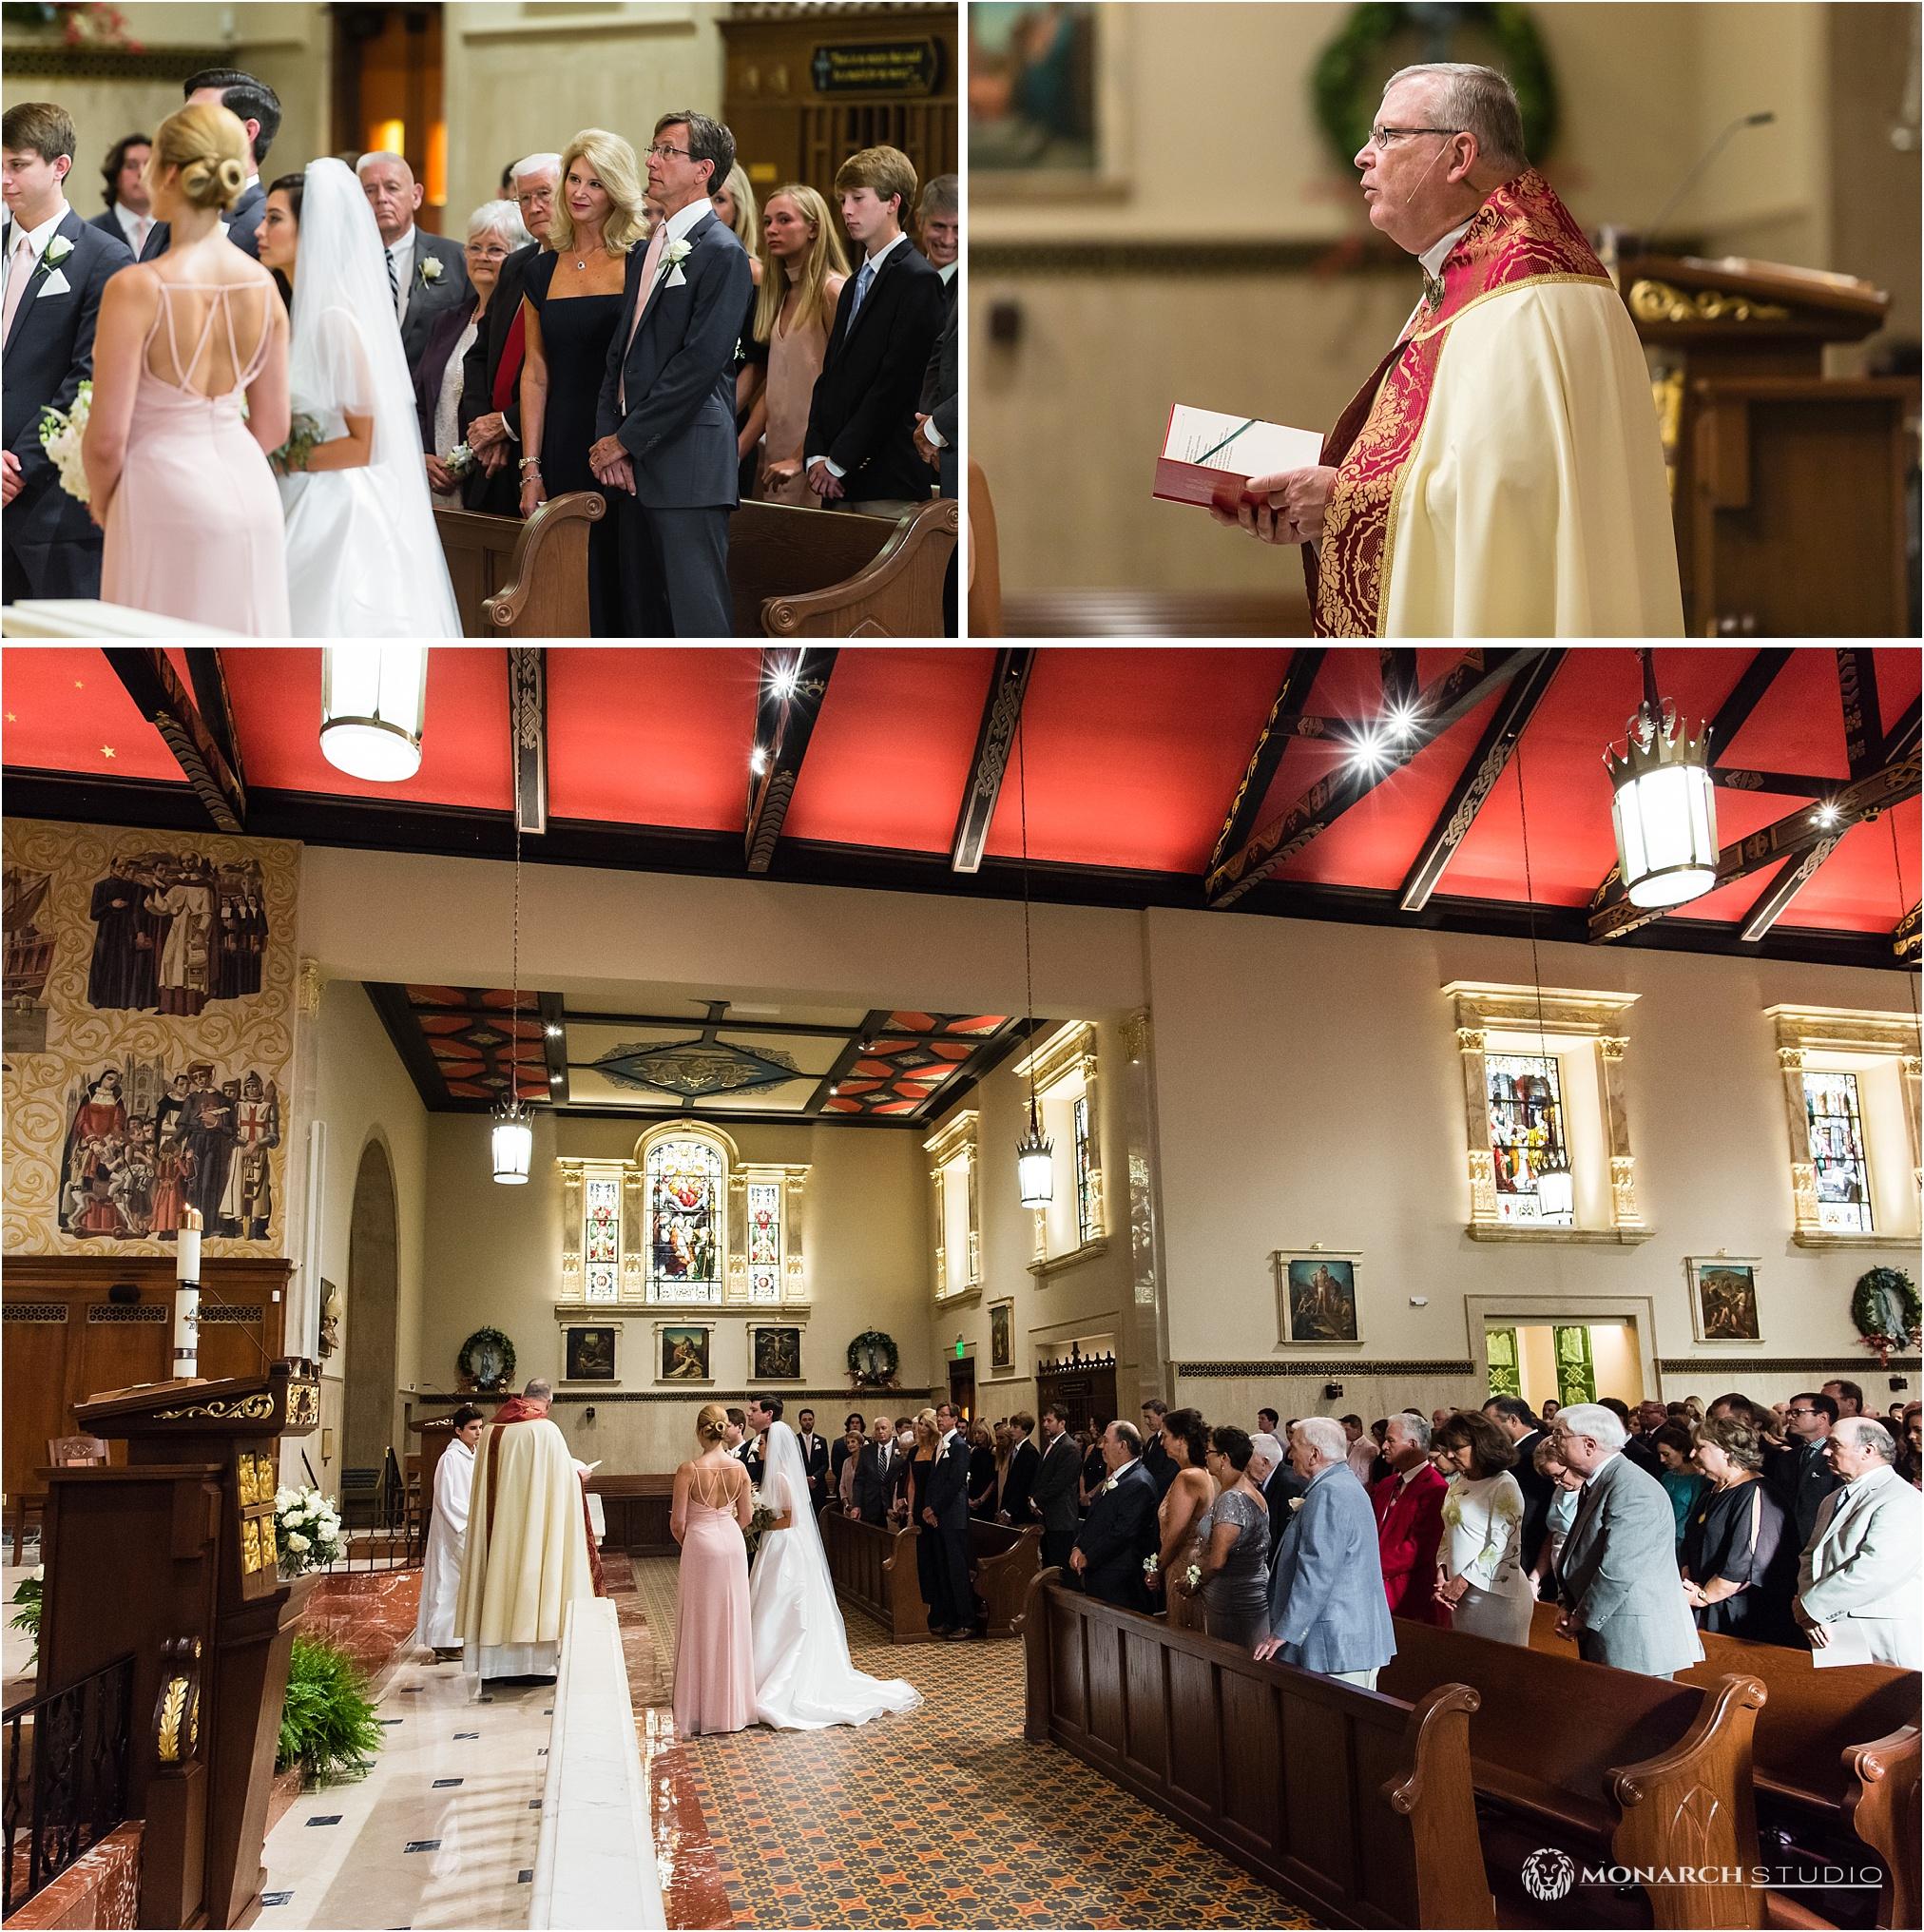 st-augustine-wedding-photographer-054.jpg